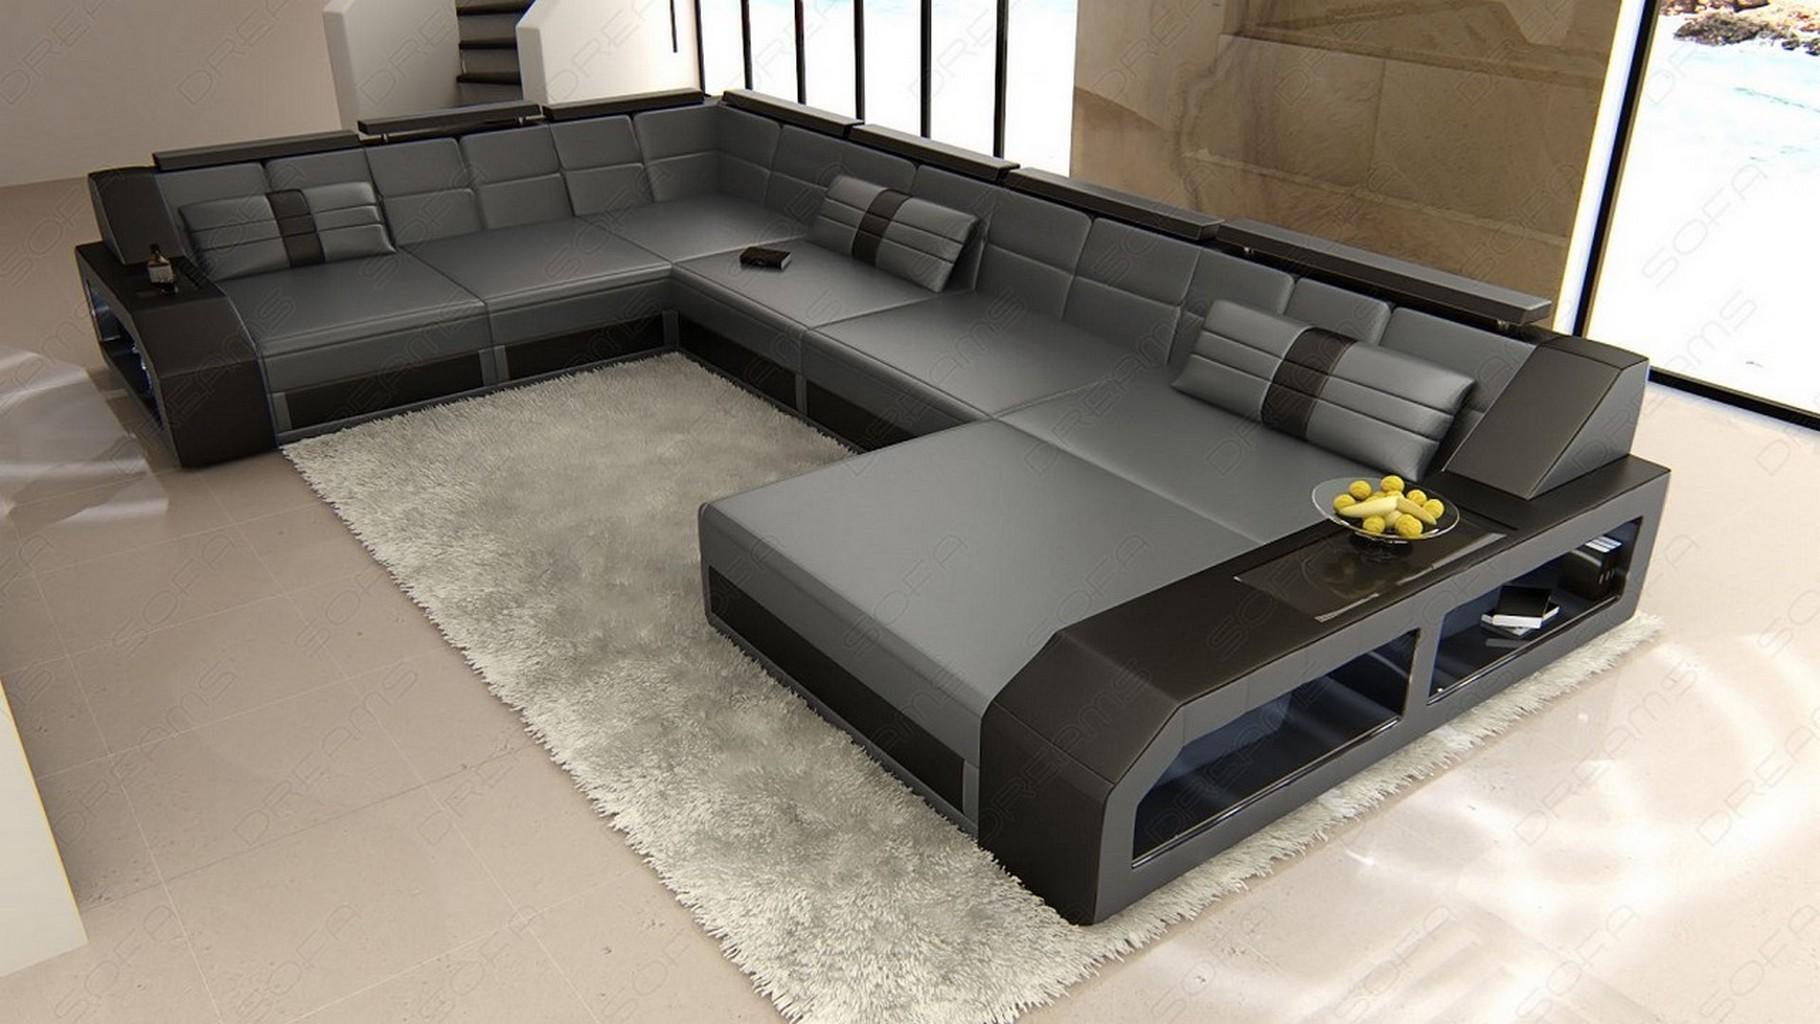 design sectional sofa matera xxl with led lights grey. Black Bedroom Furniture Sets. Home Design Ideas